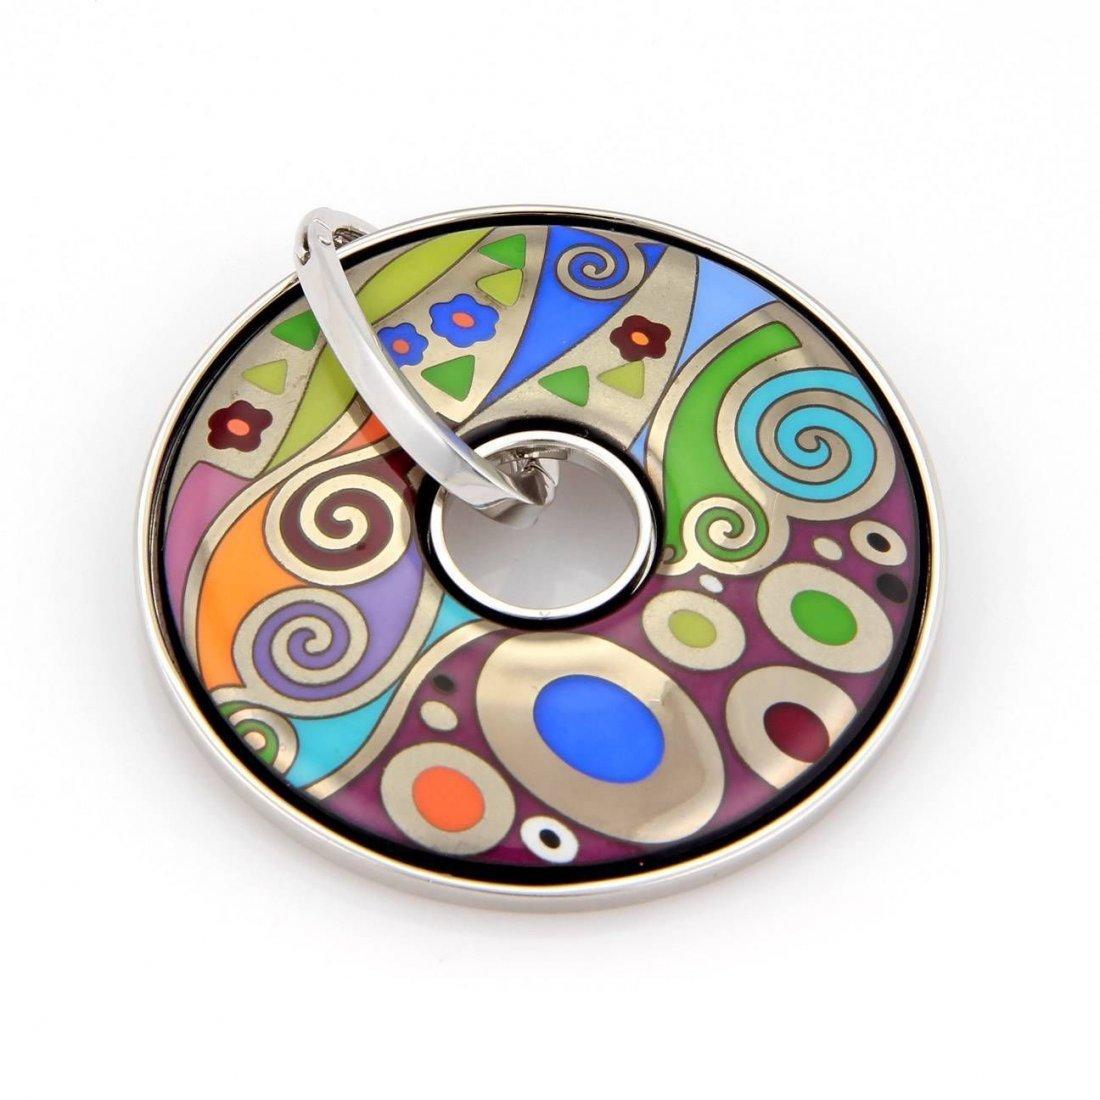 FreyWille - Pure Art - Multicolored Enamel Circle